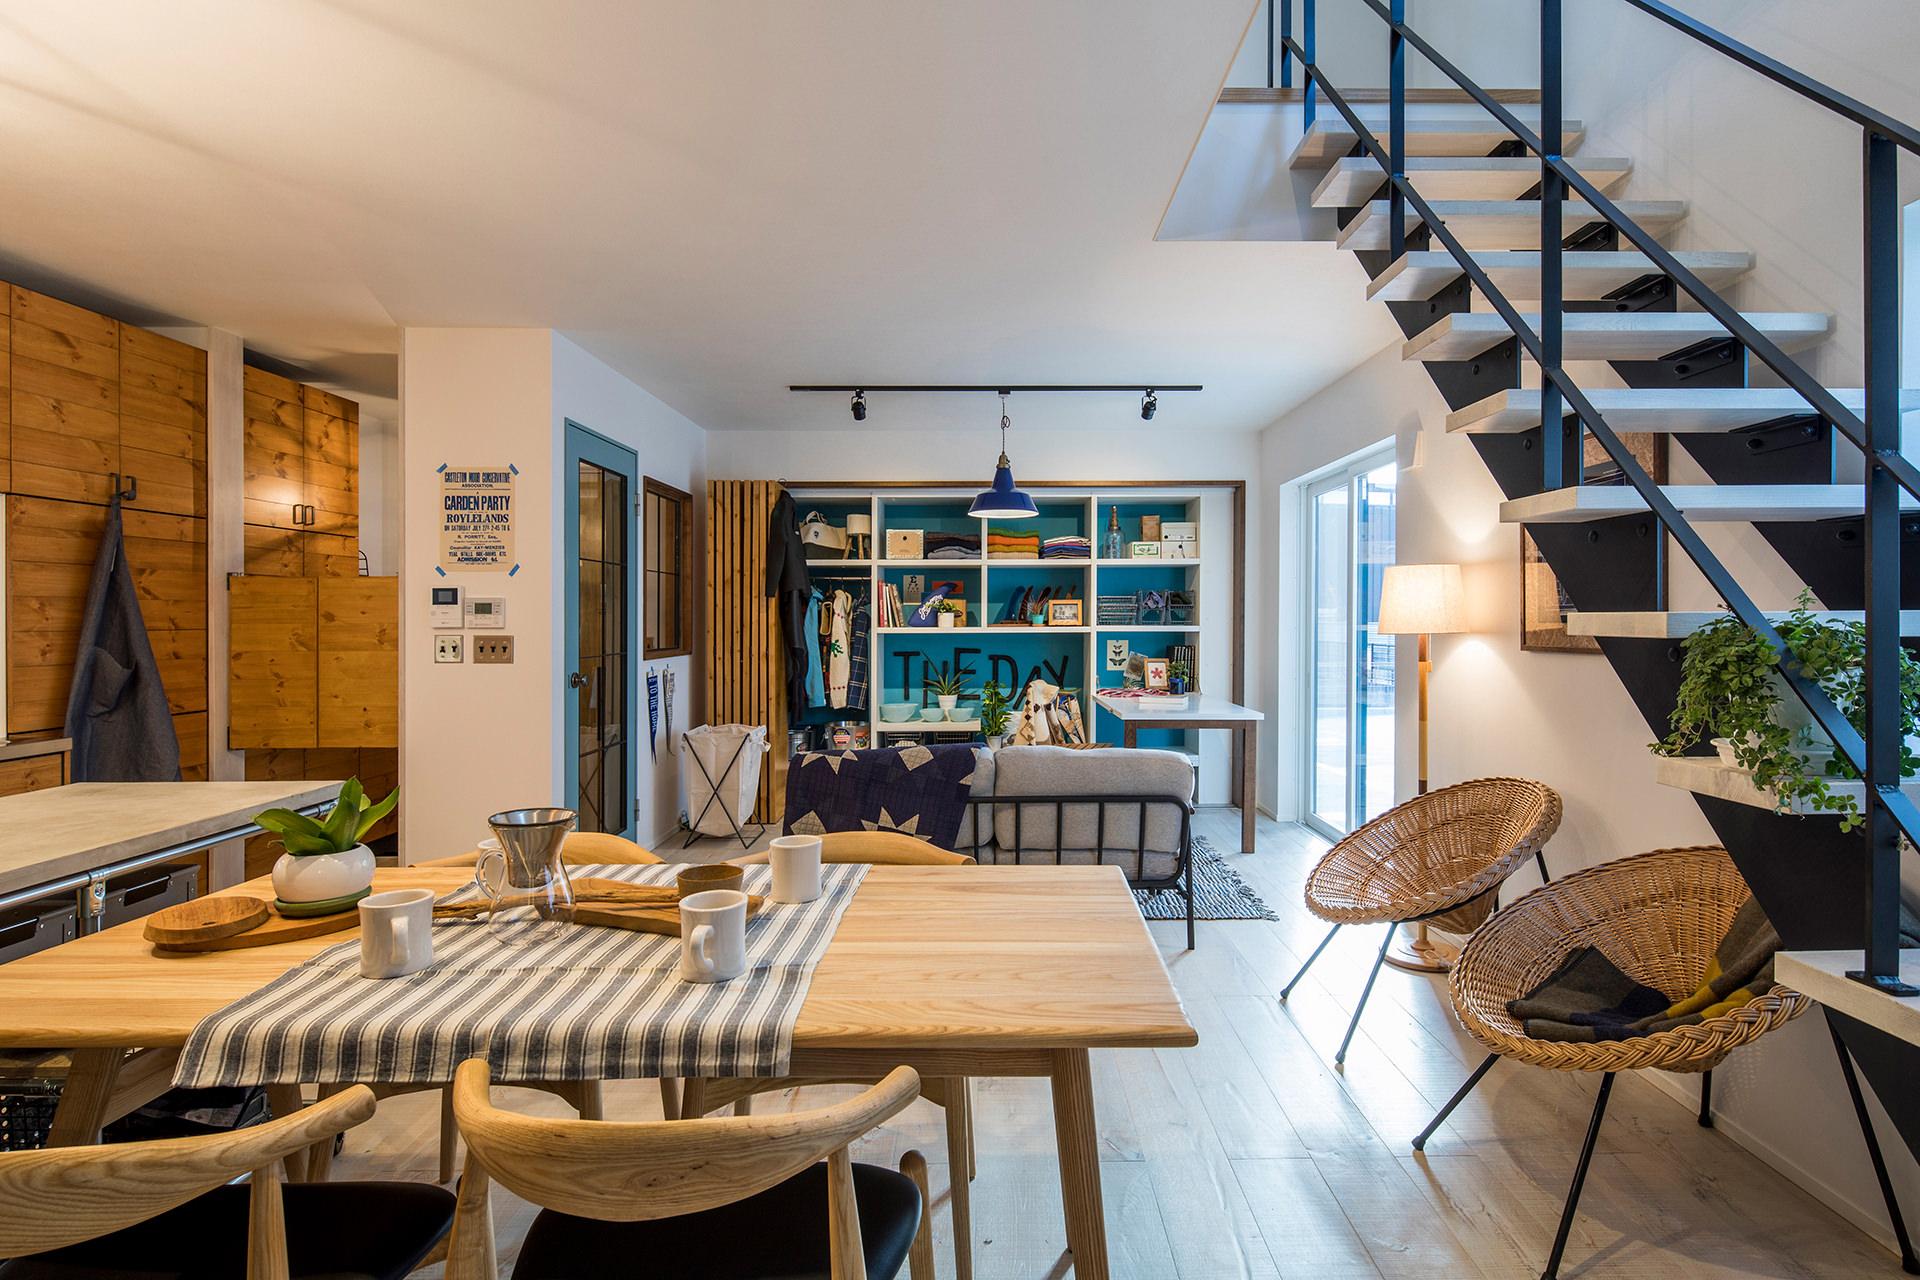 「casa rozzo(Grande blu)」イメージ07 撮影:東涌宏和